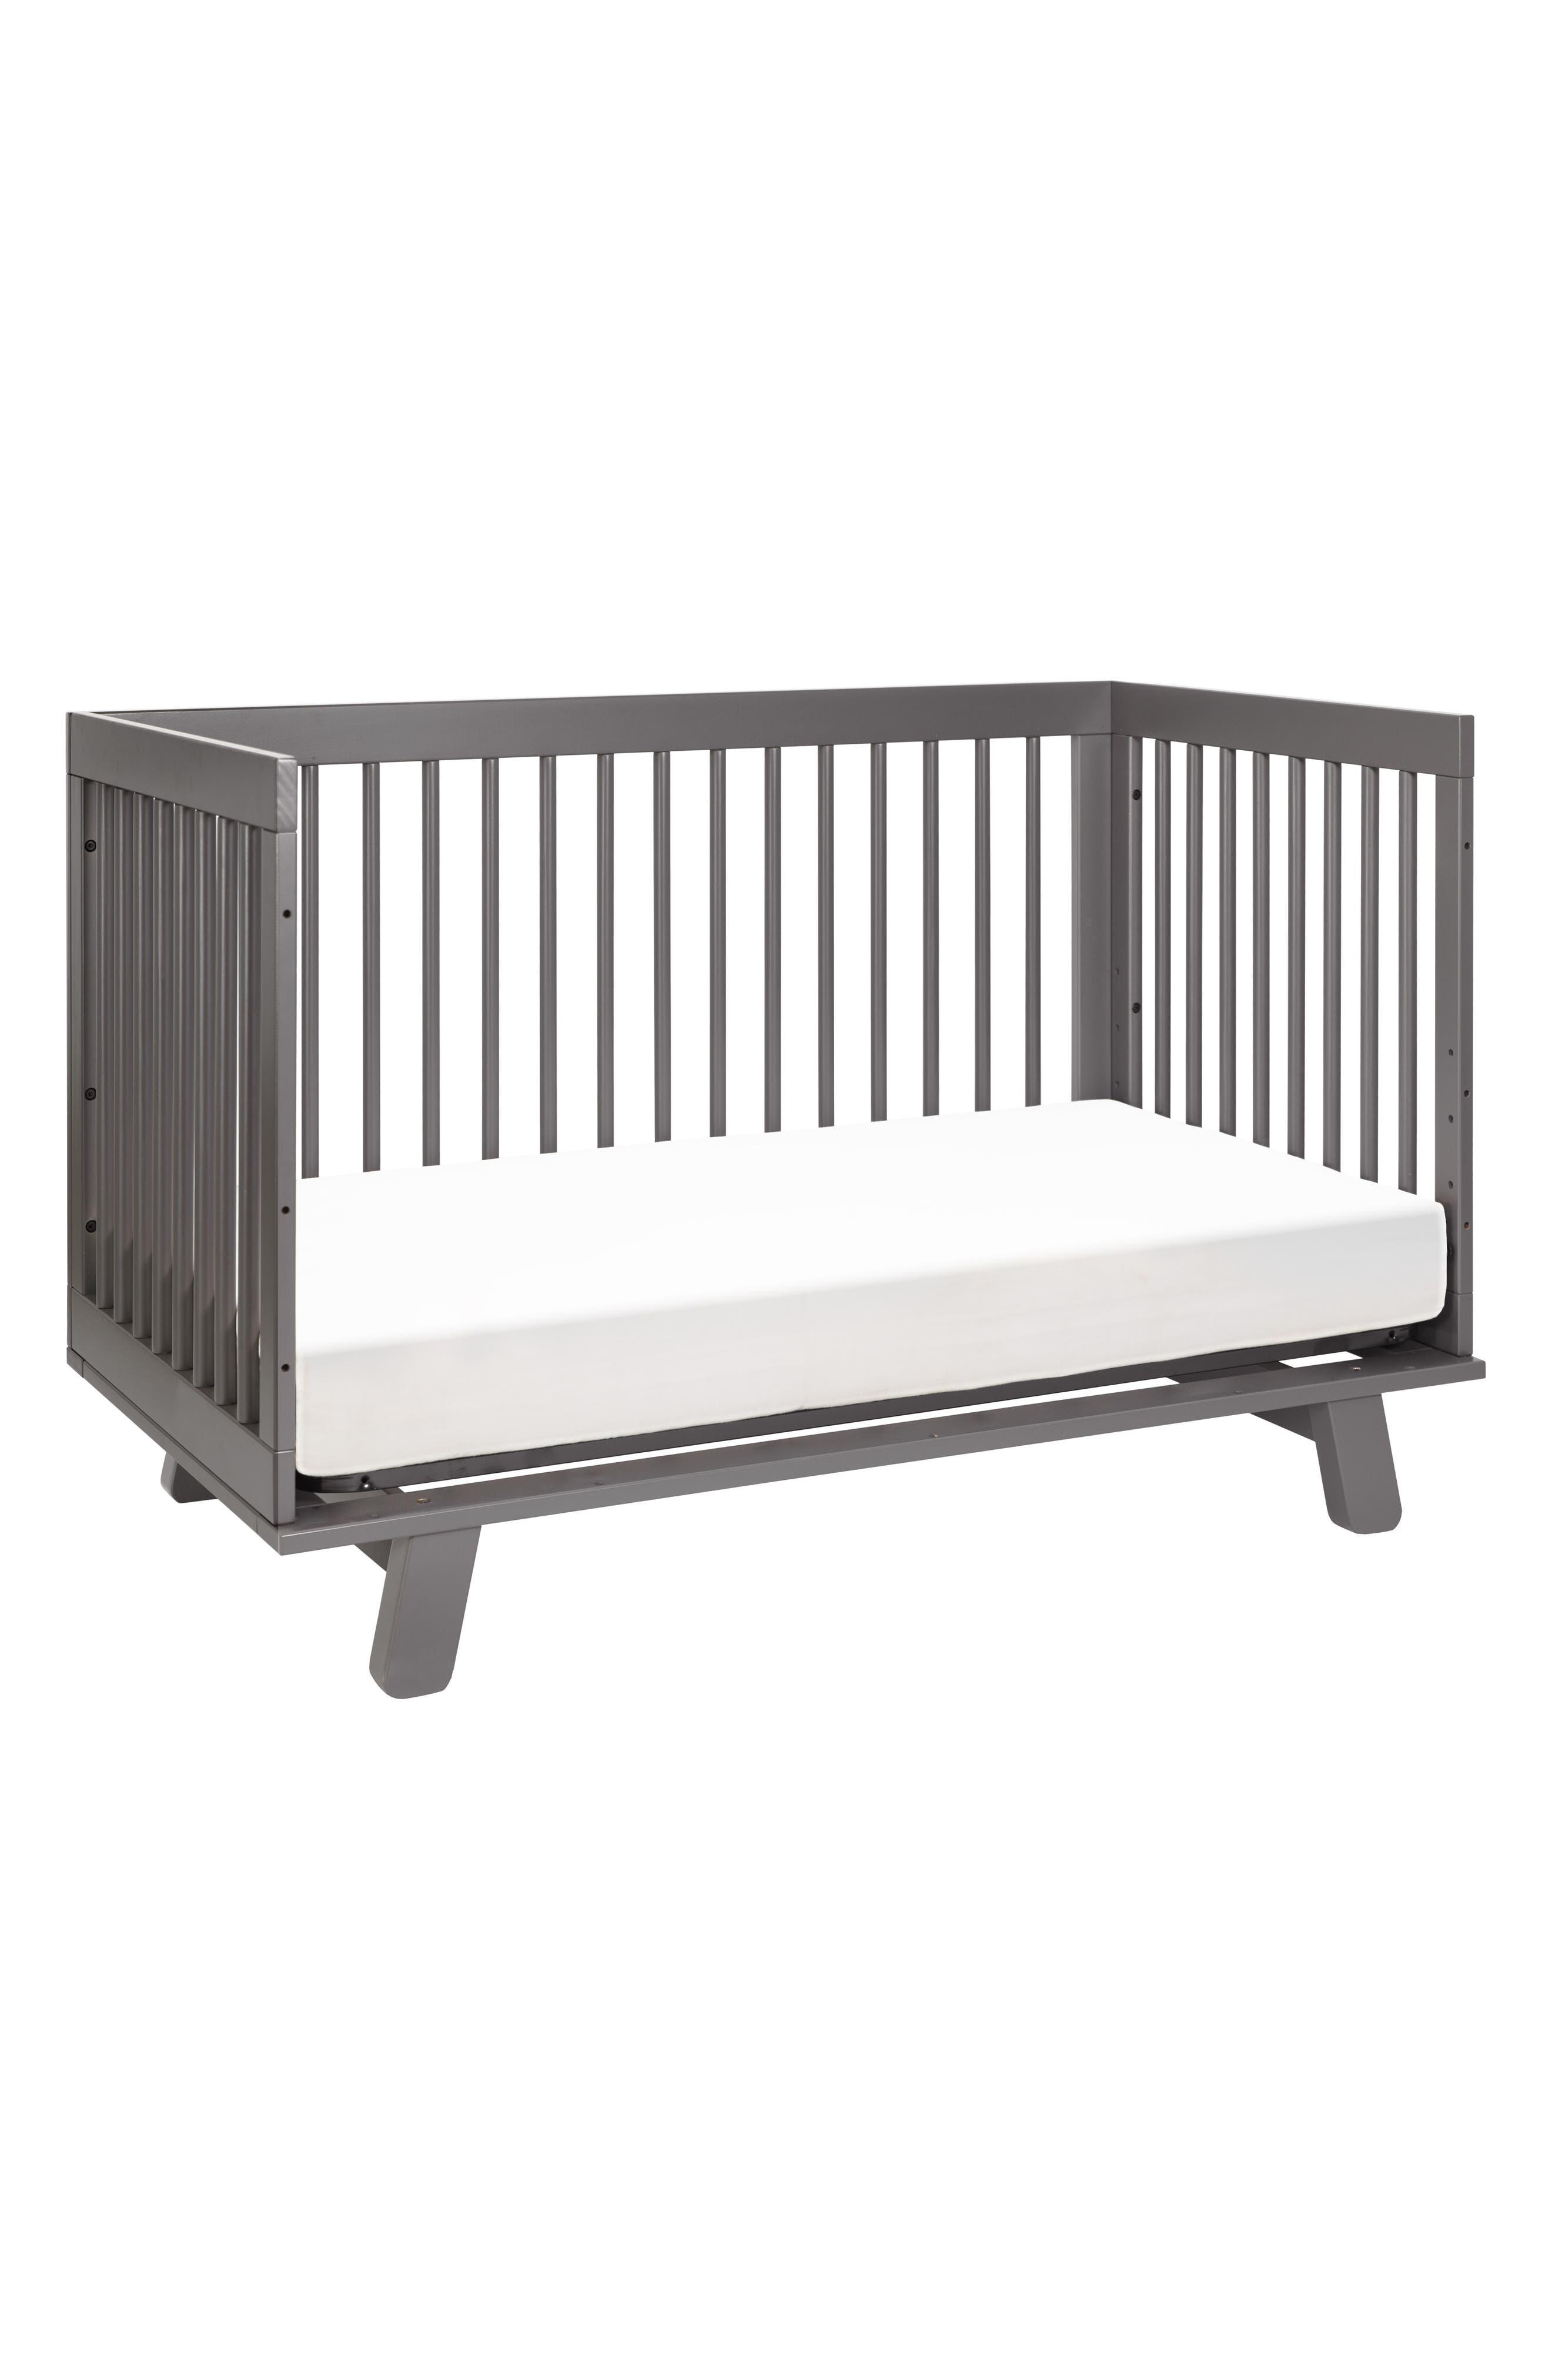 'Hudson' 3-in-1 Convertible Crib,                             Alternate thumbnail 4, color,                             021